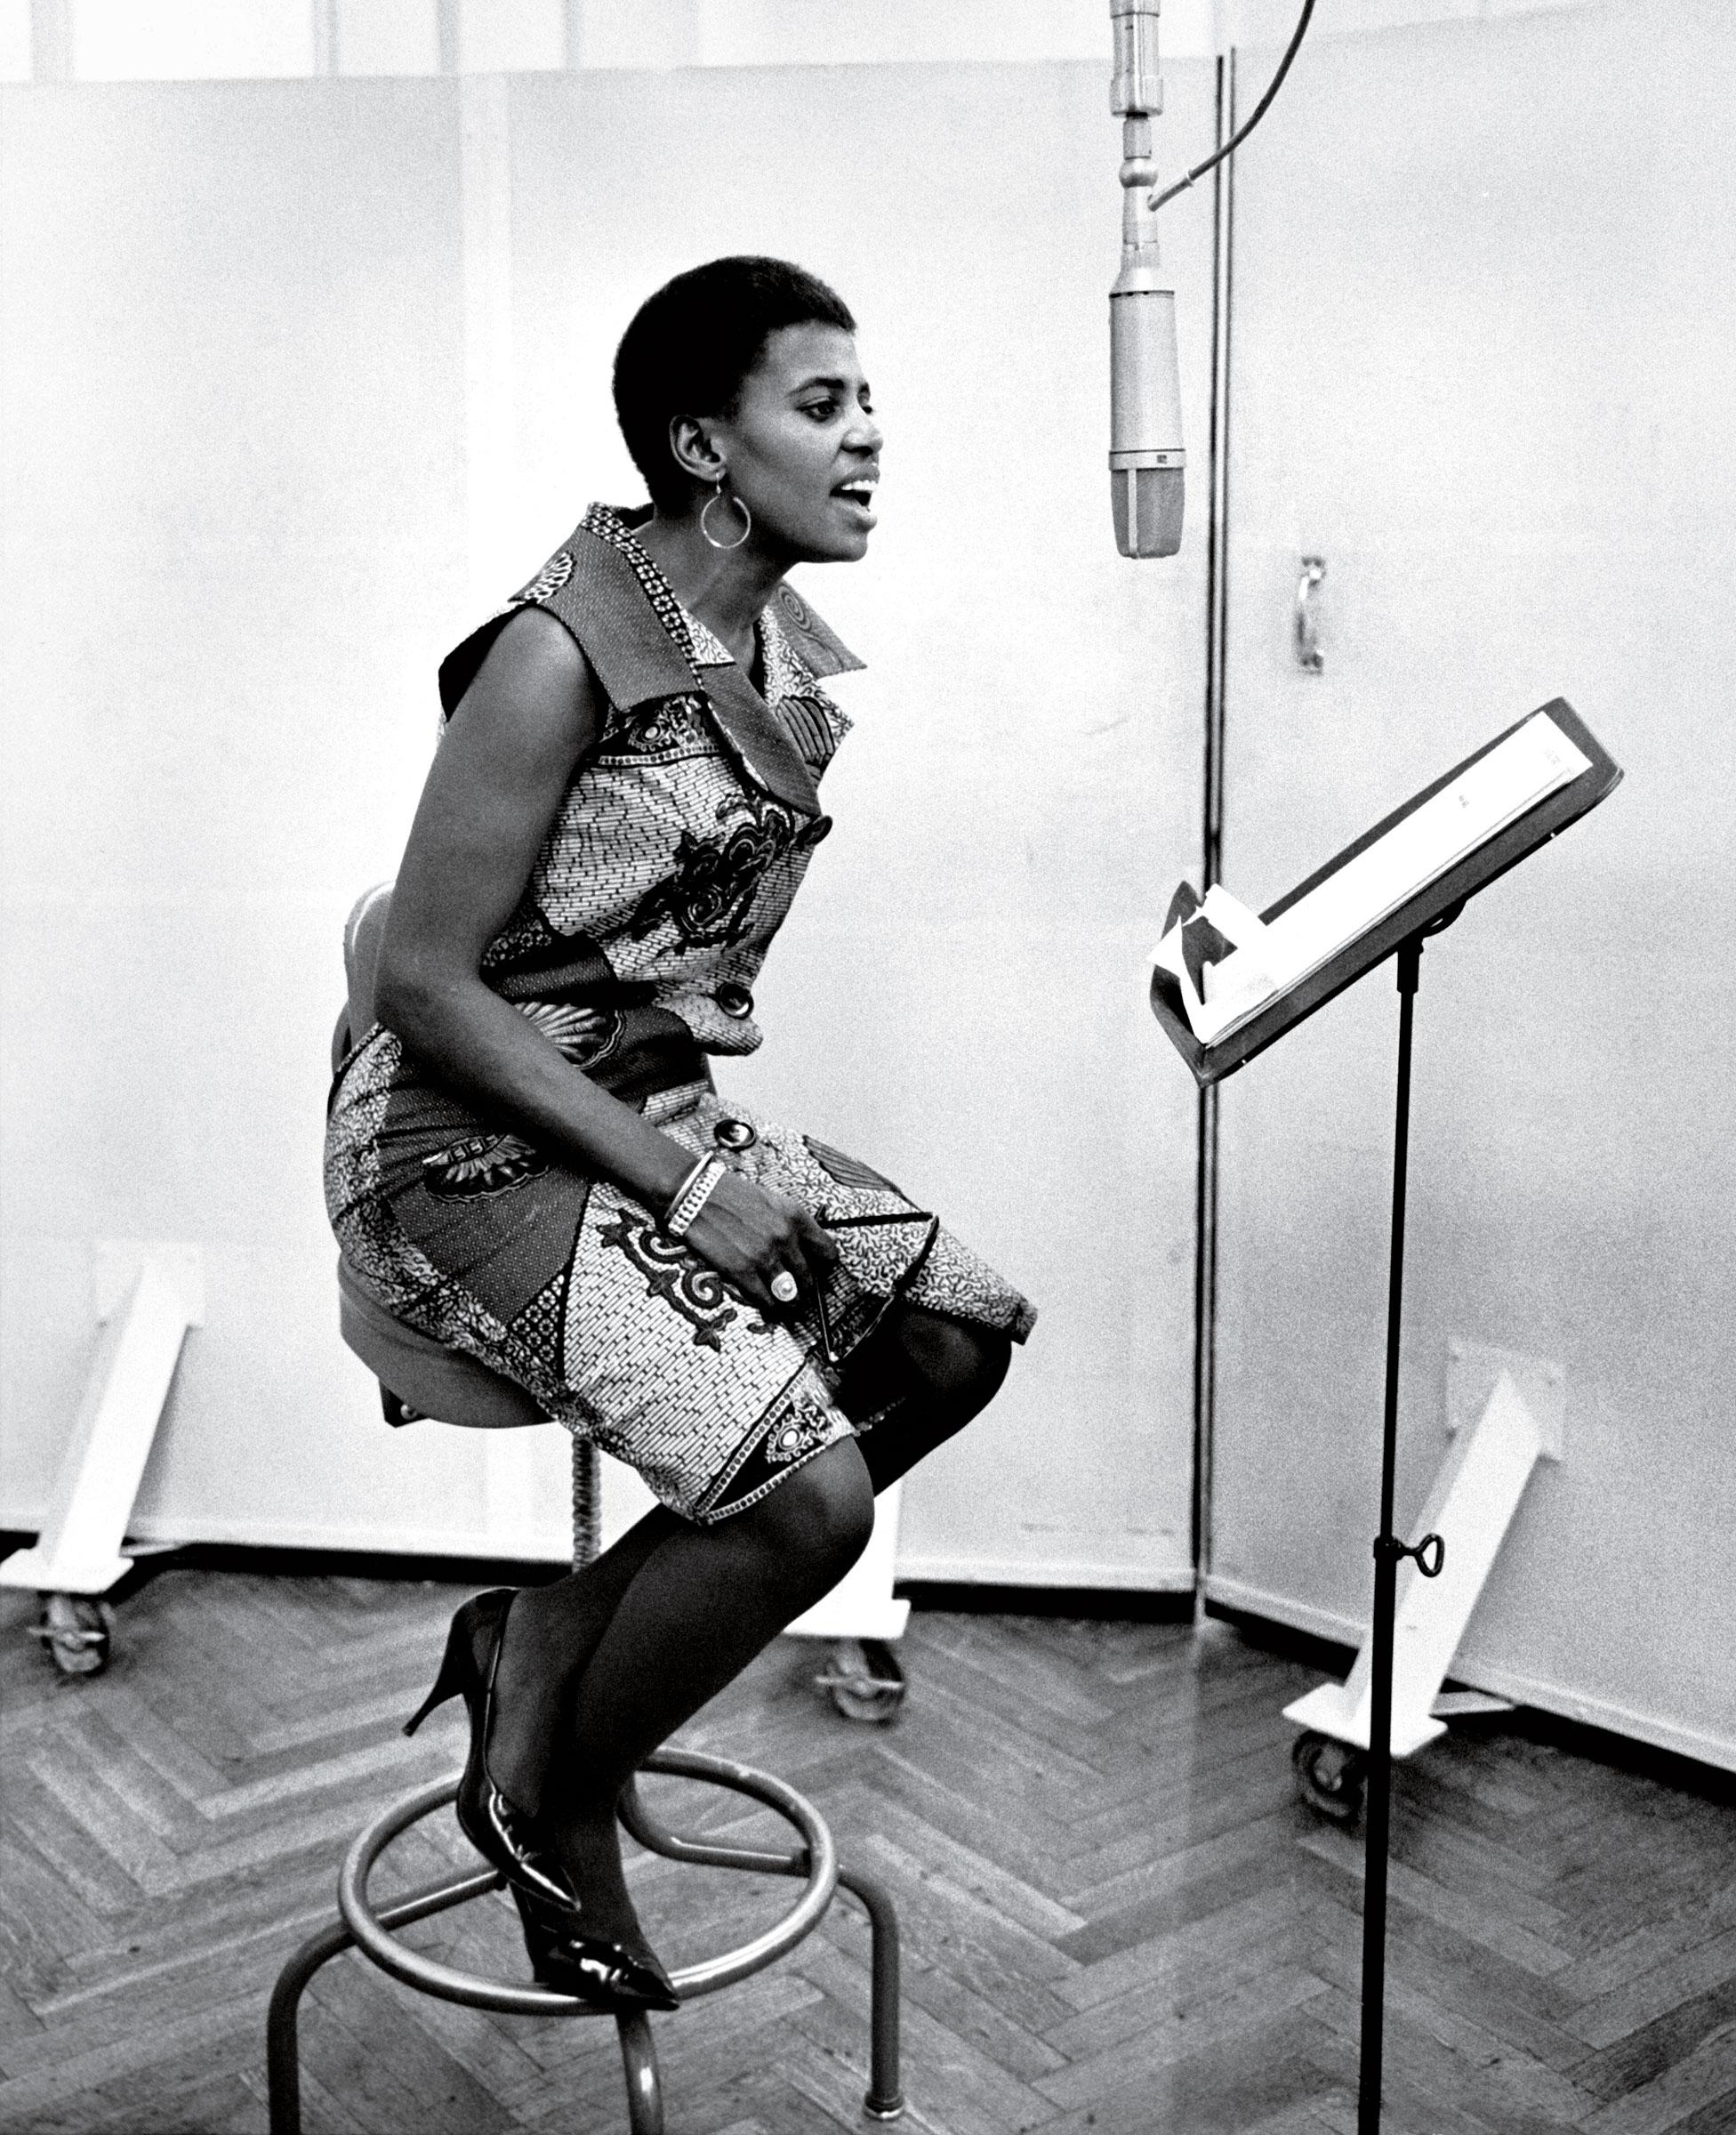 South African singer Zenzi Miriam Makeba in the RCA recording studios in the 1960s in New York City.